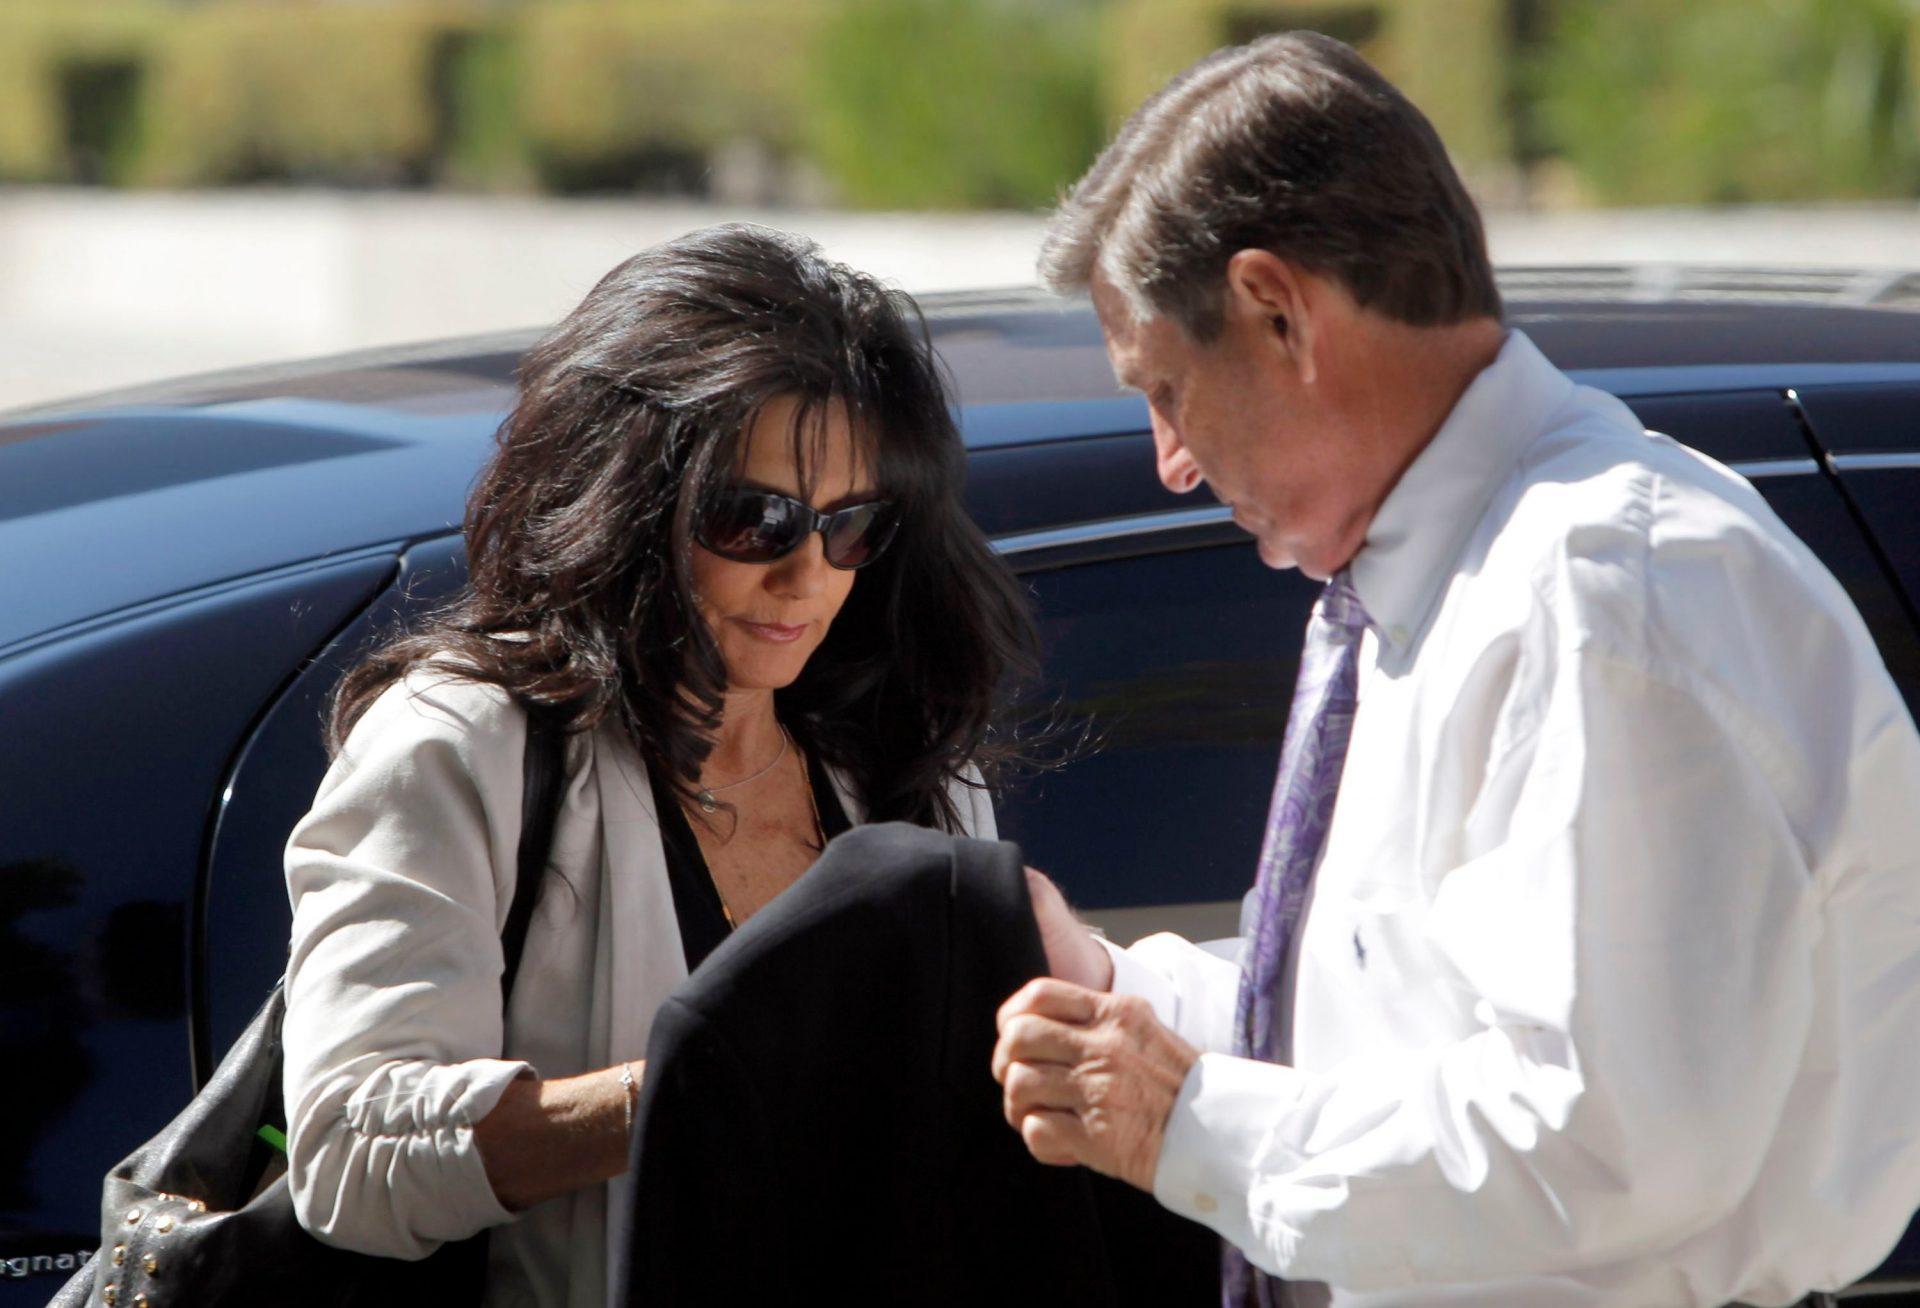 Mandatory Credit: Photo by Nick Ut/AP/Shutterstock (6223672b)Lynne Spears, Jamie Spears Britney Spears' parents, Lynne Spears, left, and Jamie Spears arrive at court in Los Angeles.